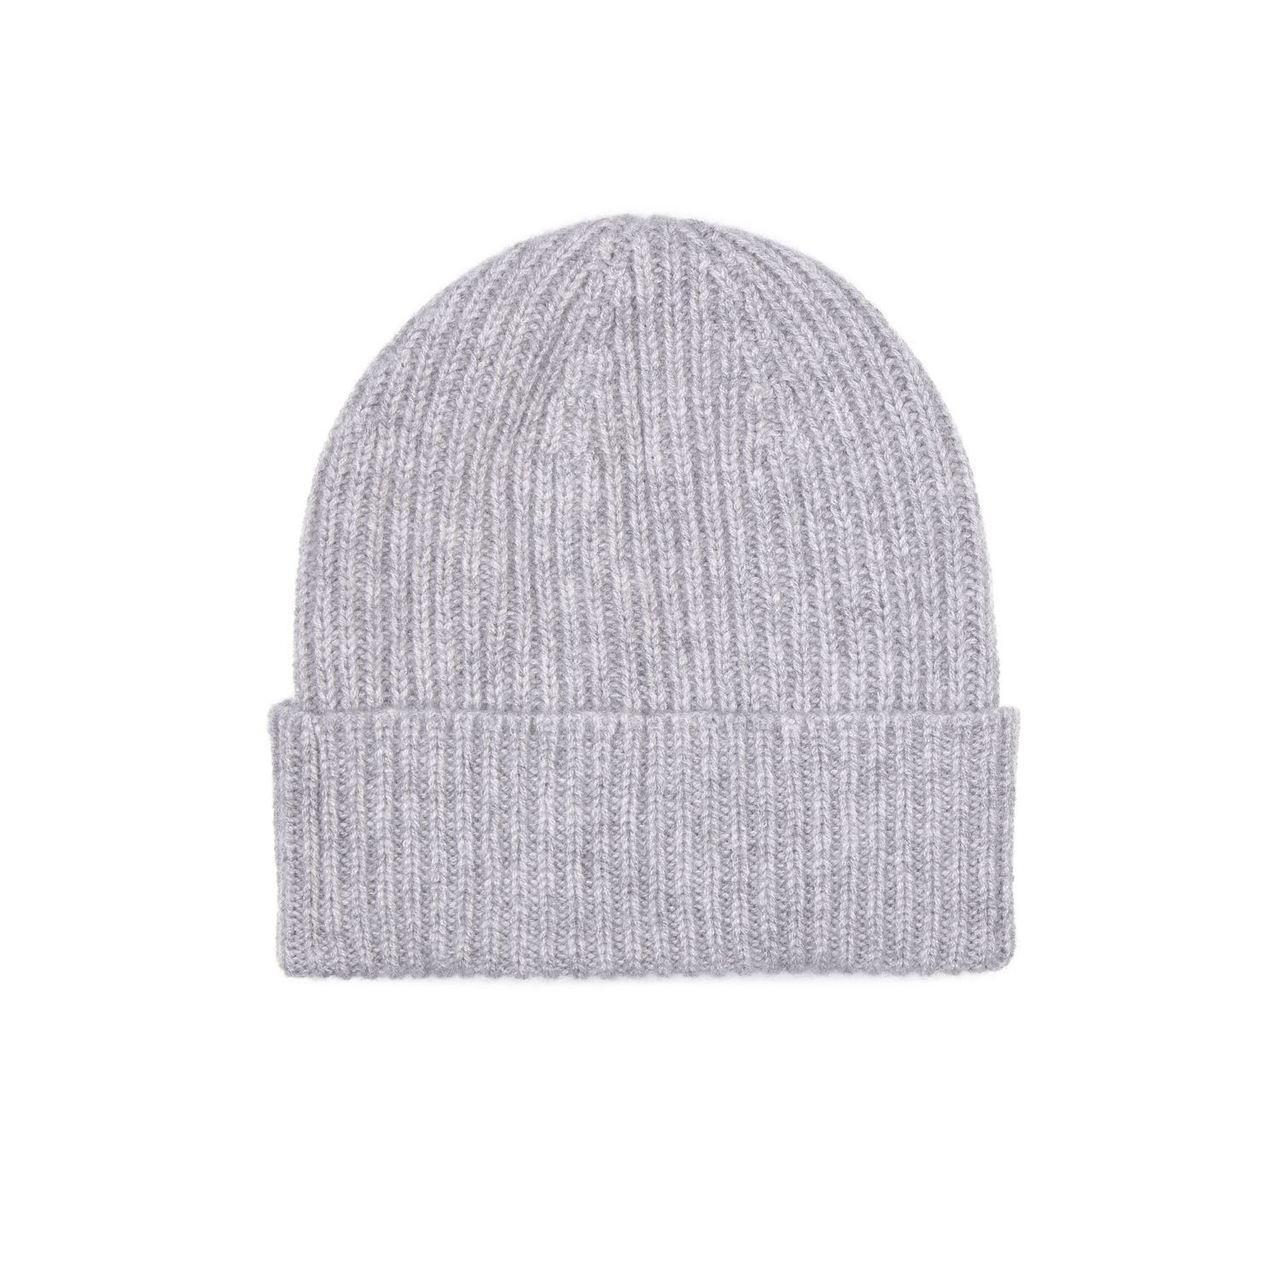 52dbabb56 Mens Cashmere Beanie Hat, Grey